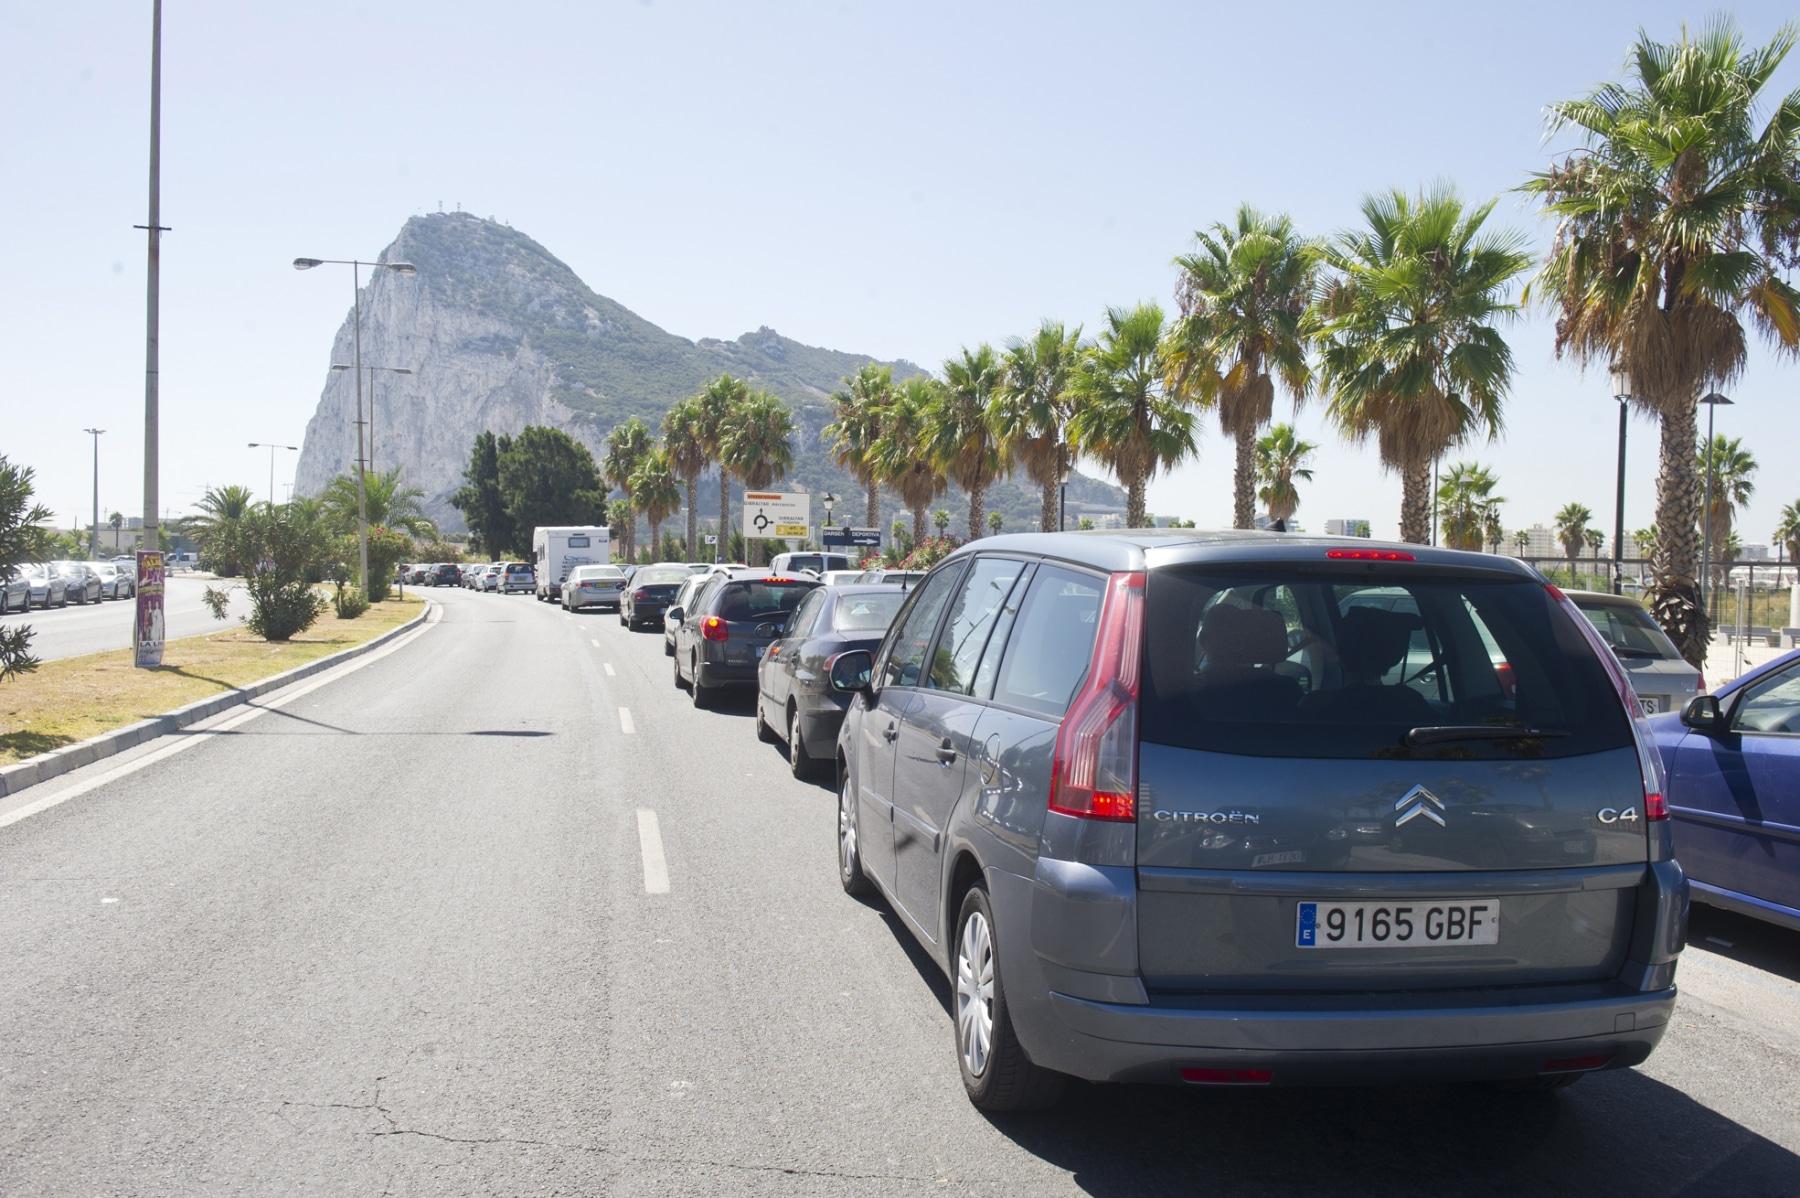 21-agosto-2014-colas-de-entrada-y-salida-de-gibraltar01_14803072069_o